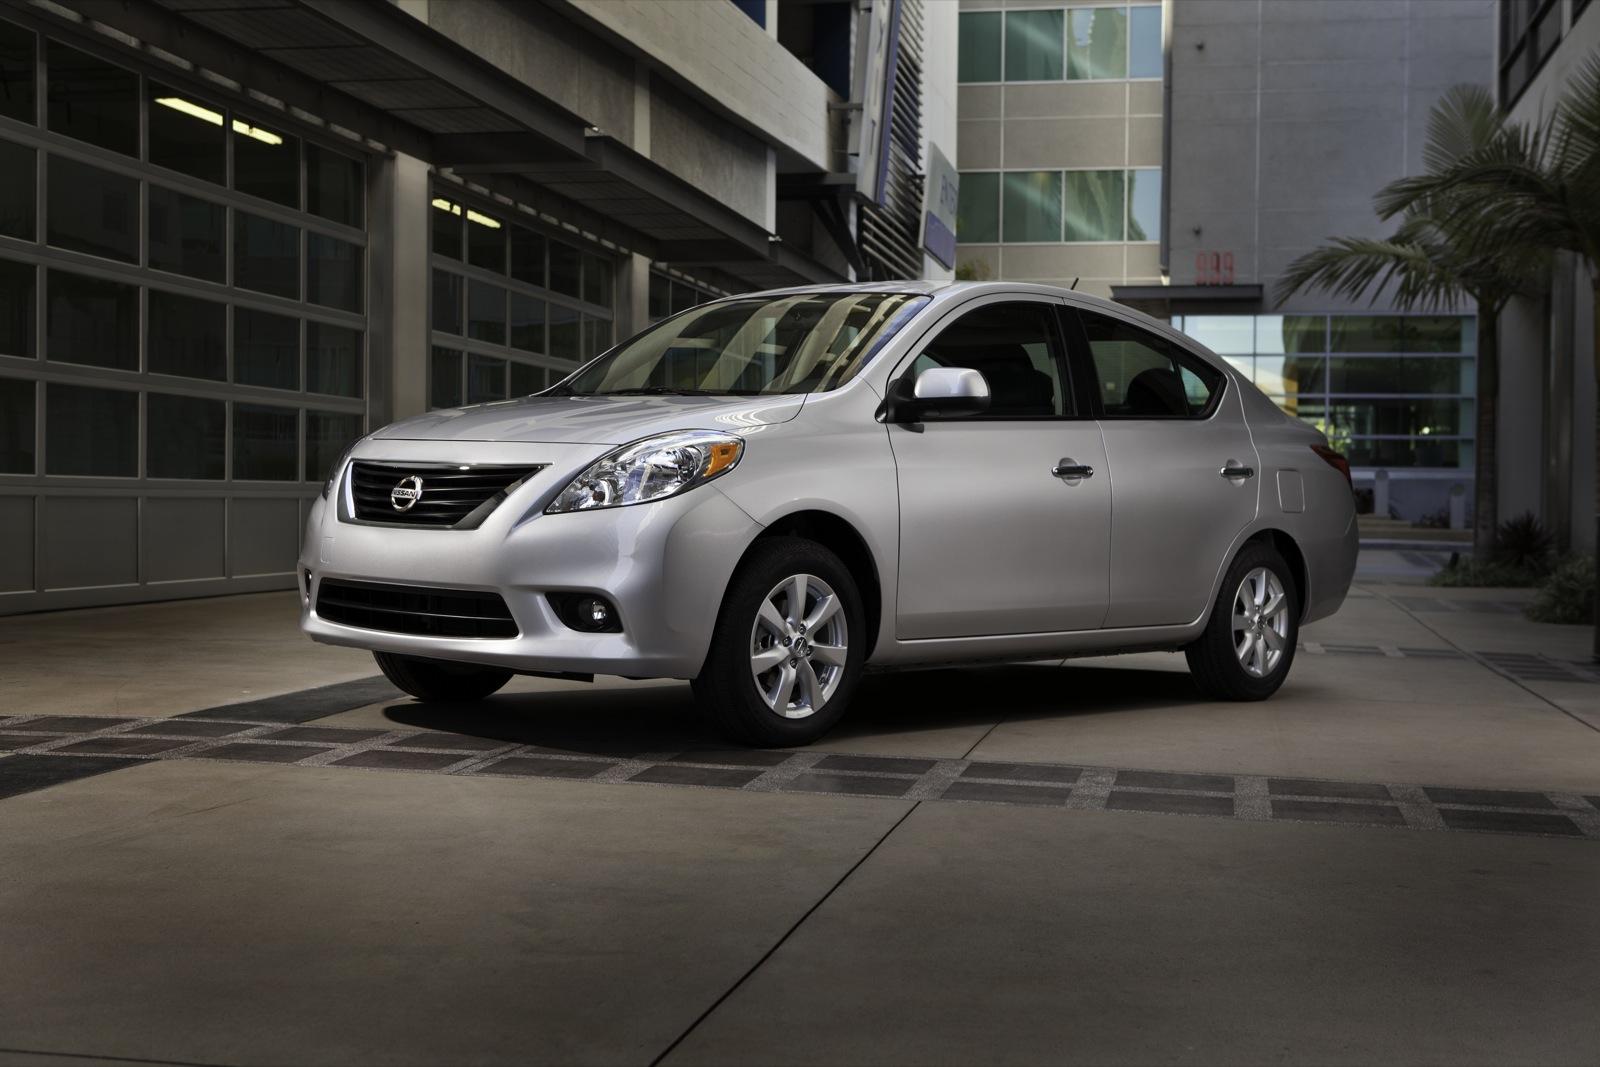 2012 Nissan Versa Recalled For Transmission Problem